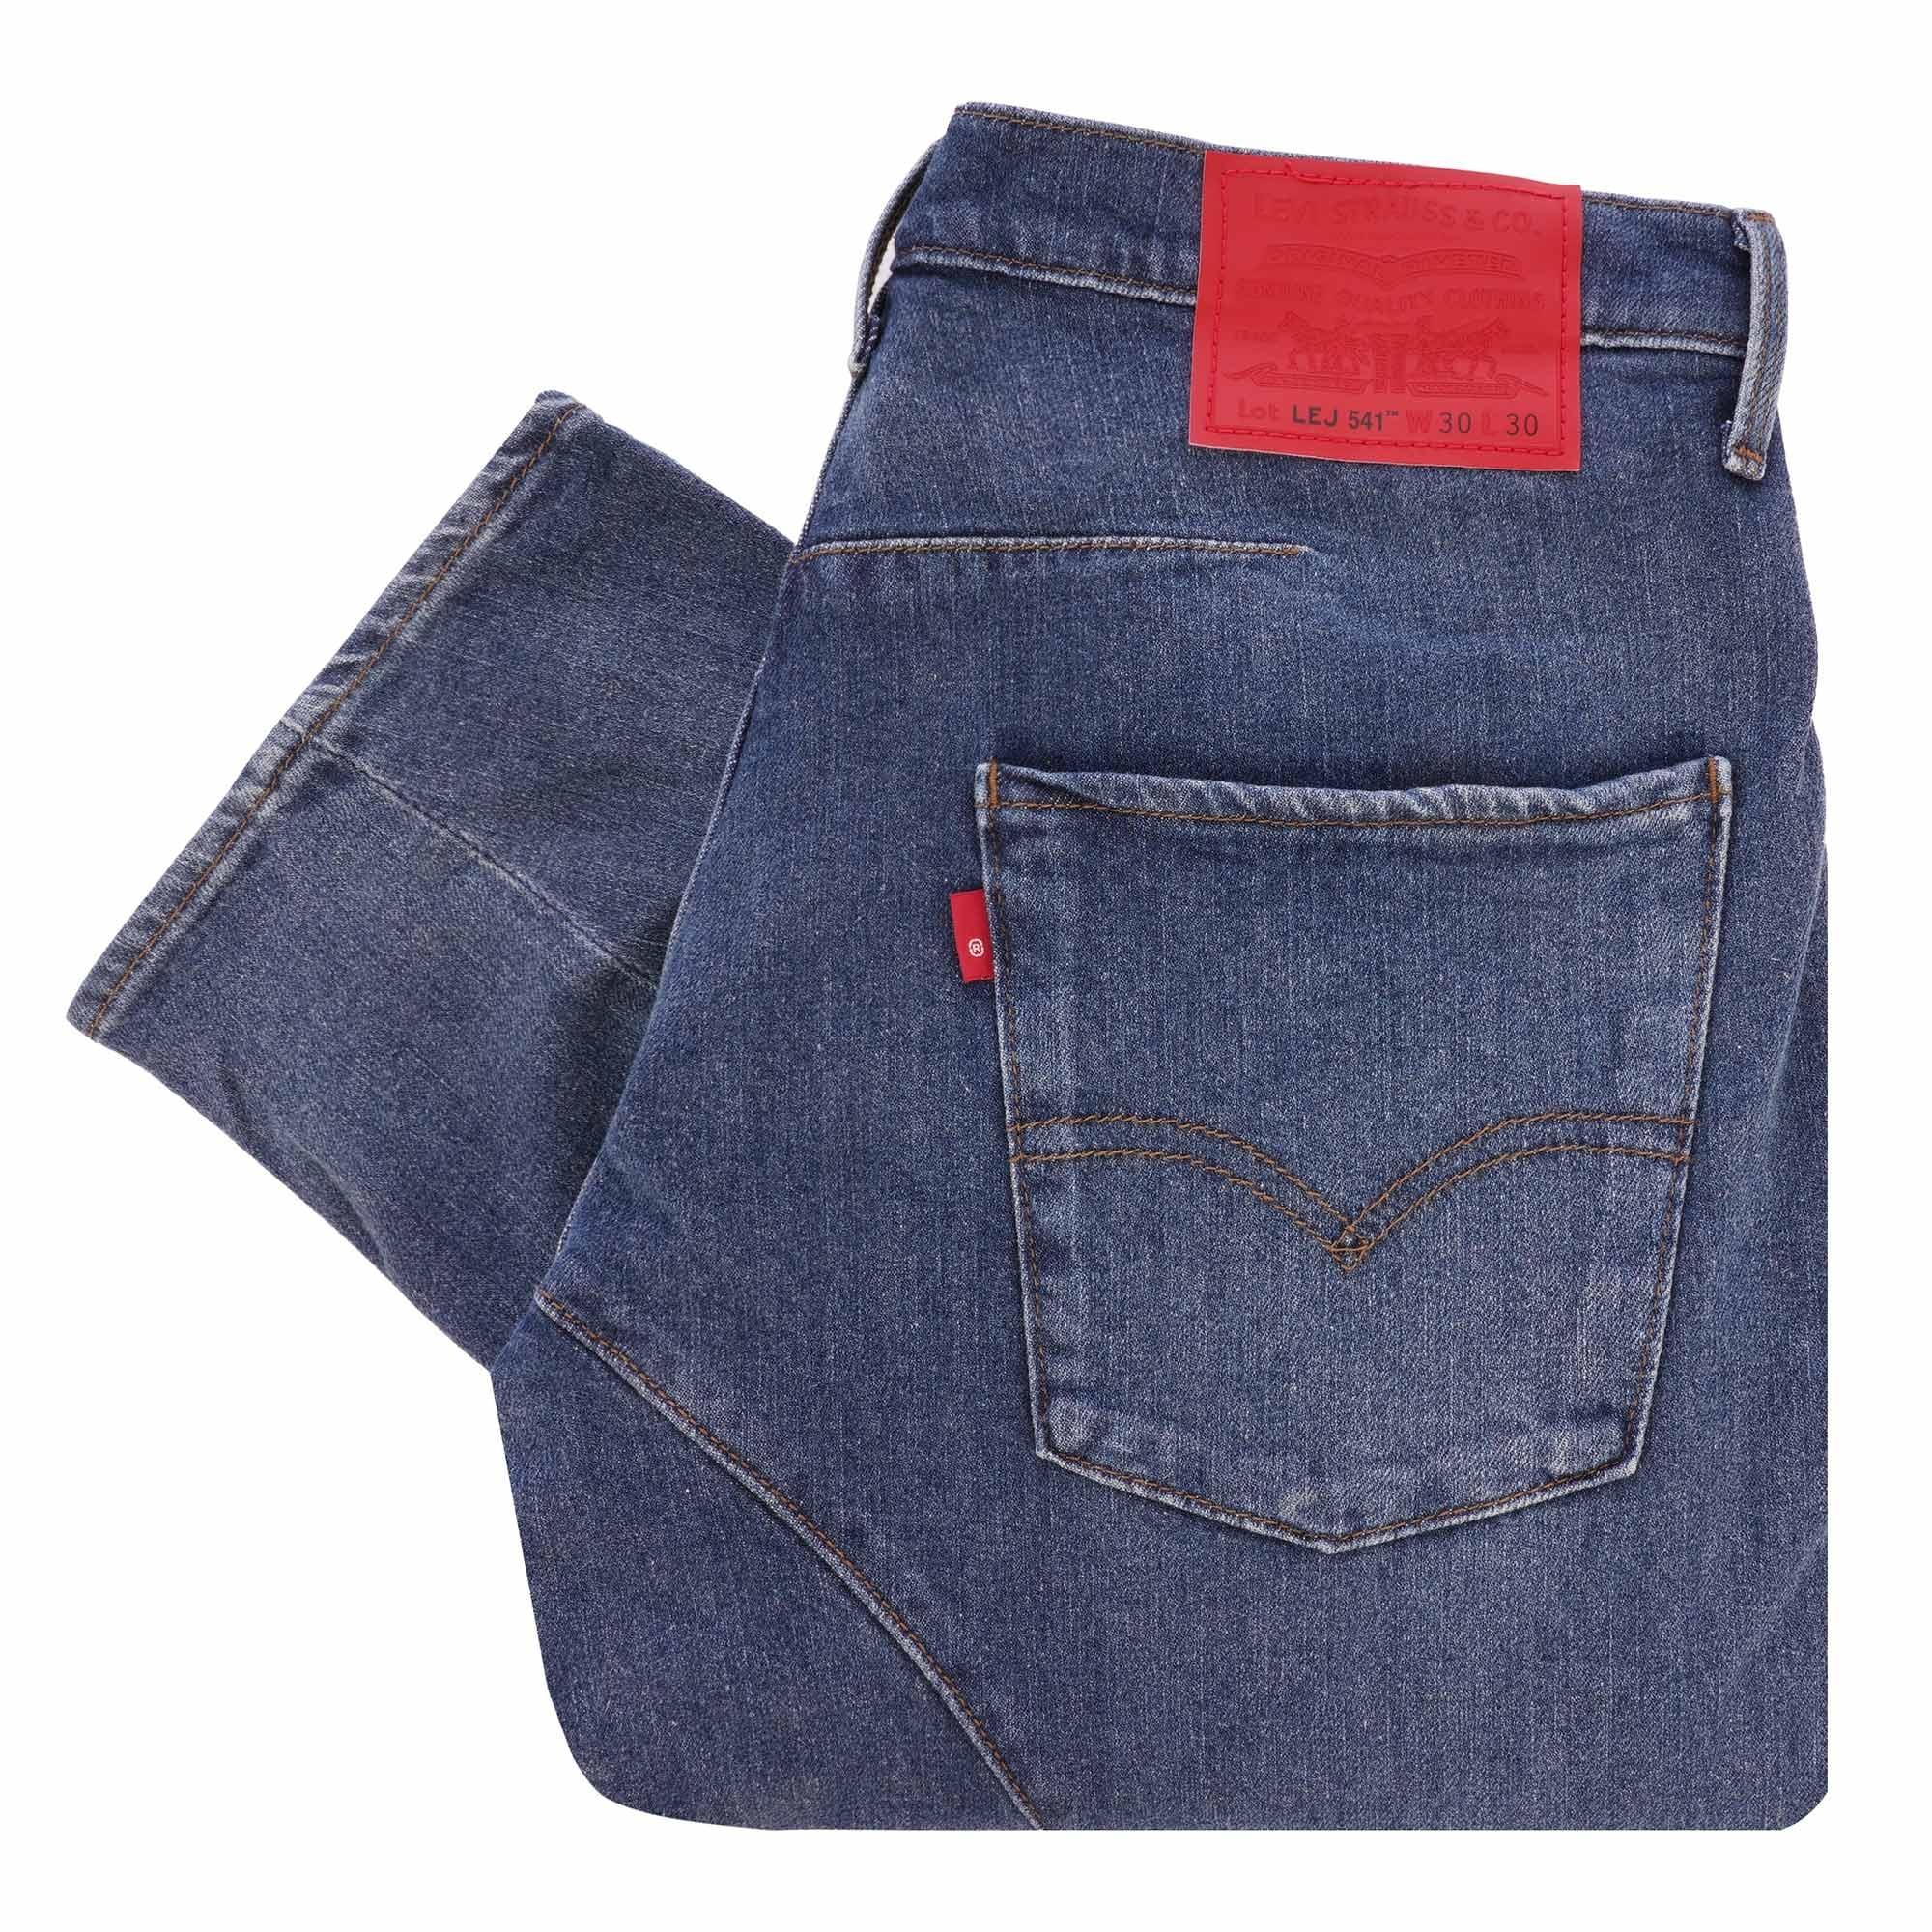 eb884dec5a1 Levi's Engineered Jeans 541 Athletic Taper Jeans   Pagan Indigo ...